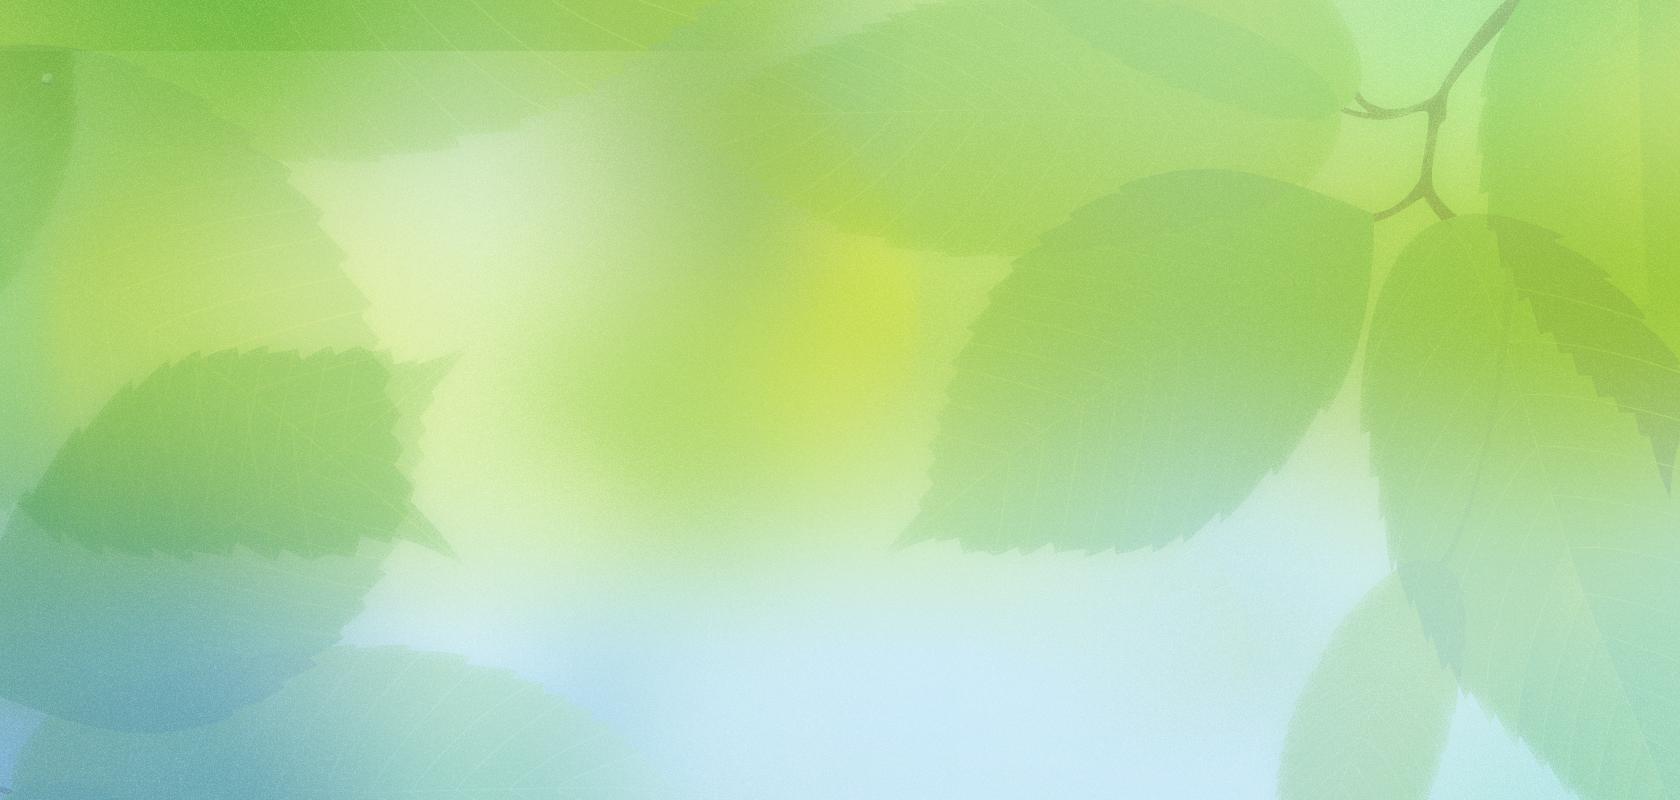 I love my company, Green Park Global (.com) :-)